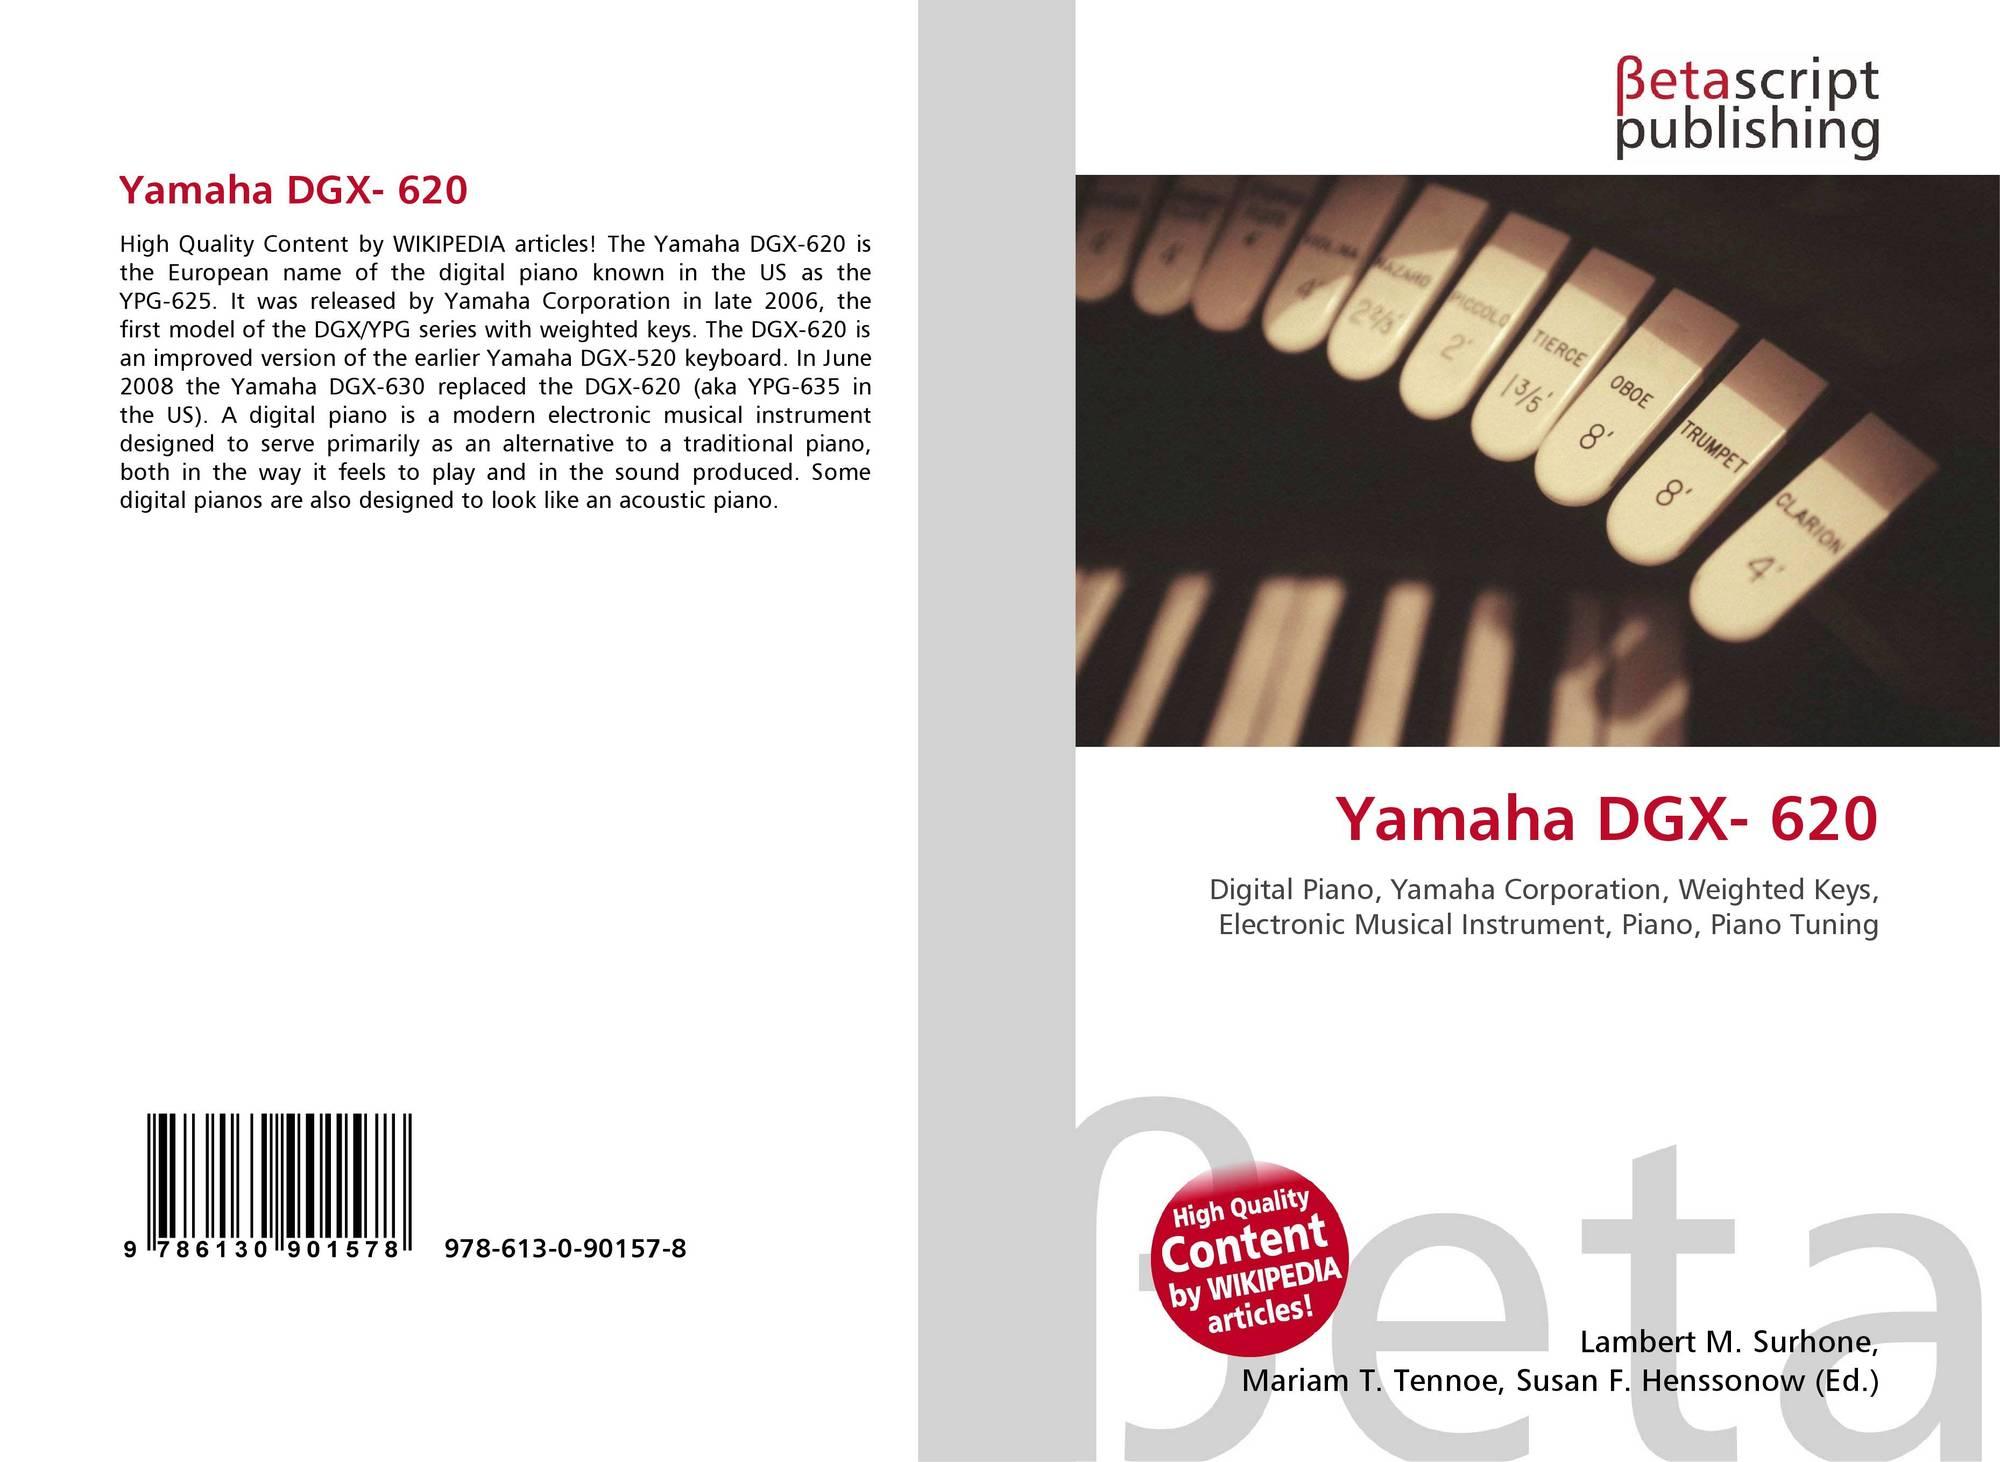 Yamaha dgx 620 978 613 0 90157 8 6130901577 9786130901578 for Yamaha dgx 630 ypg 635